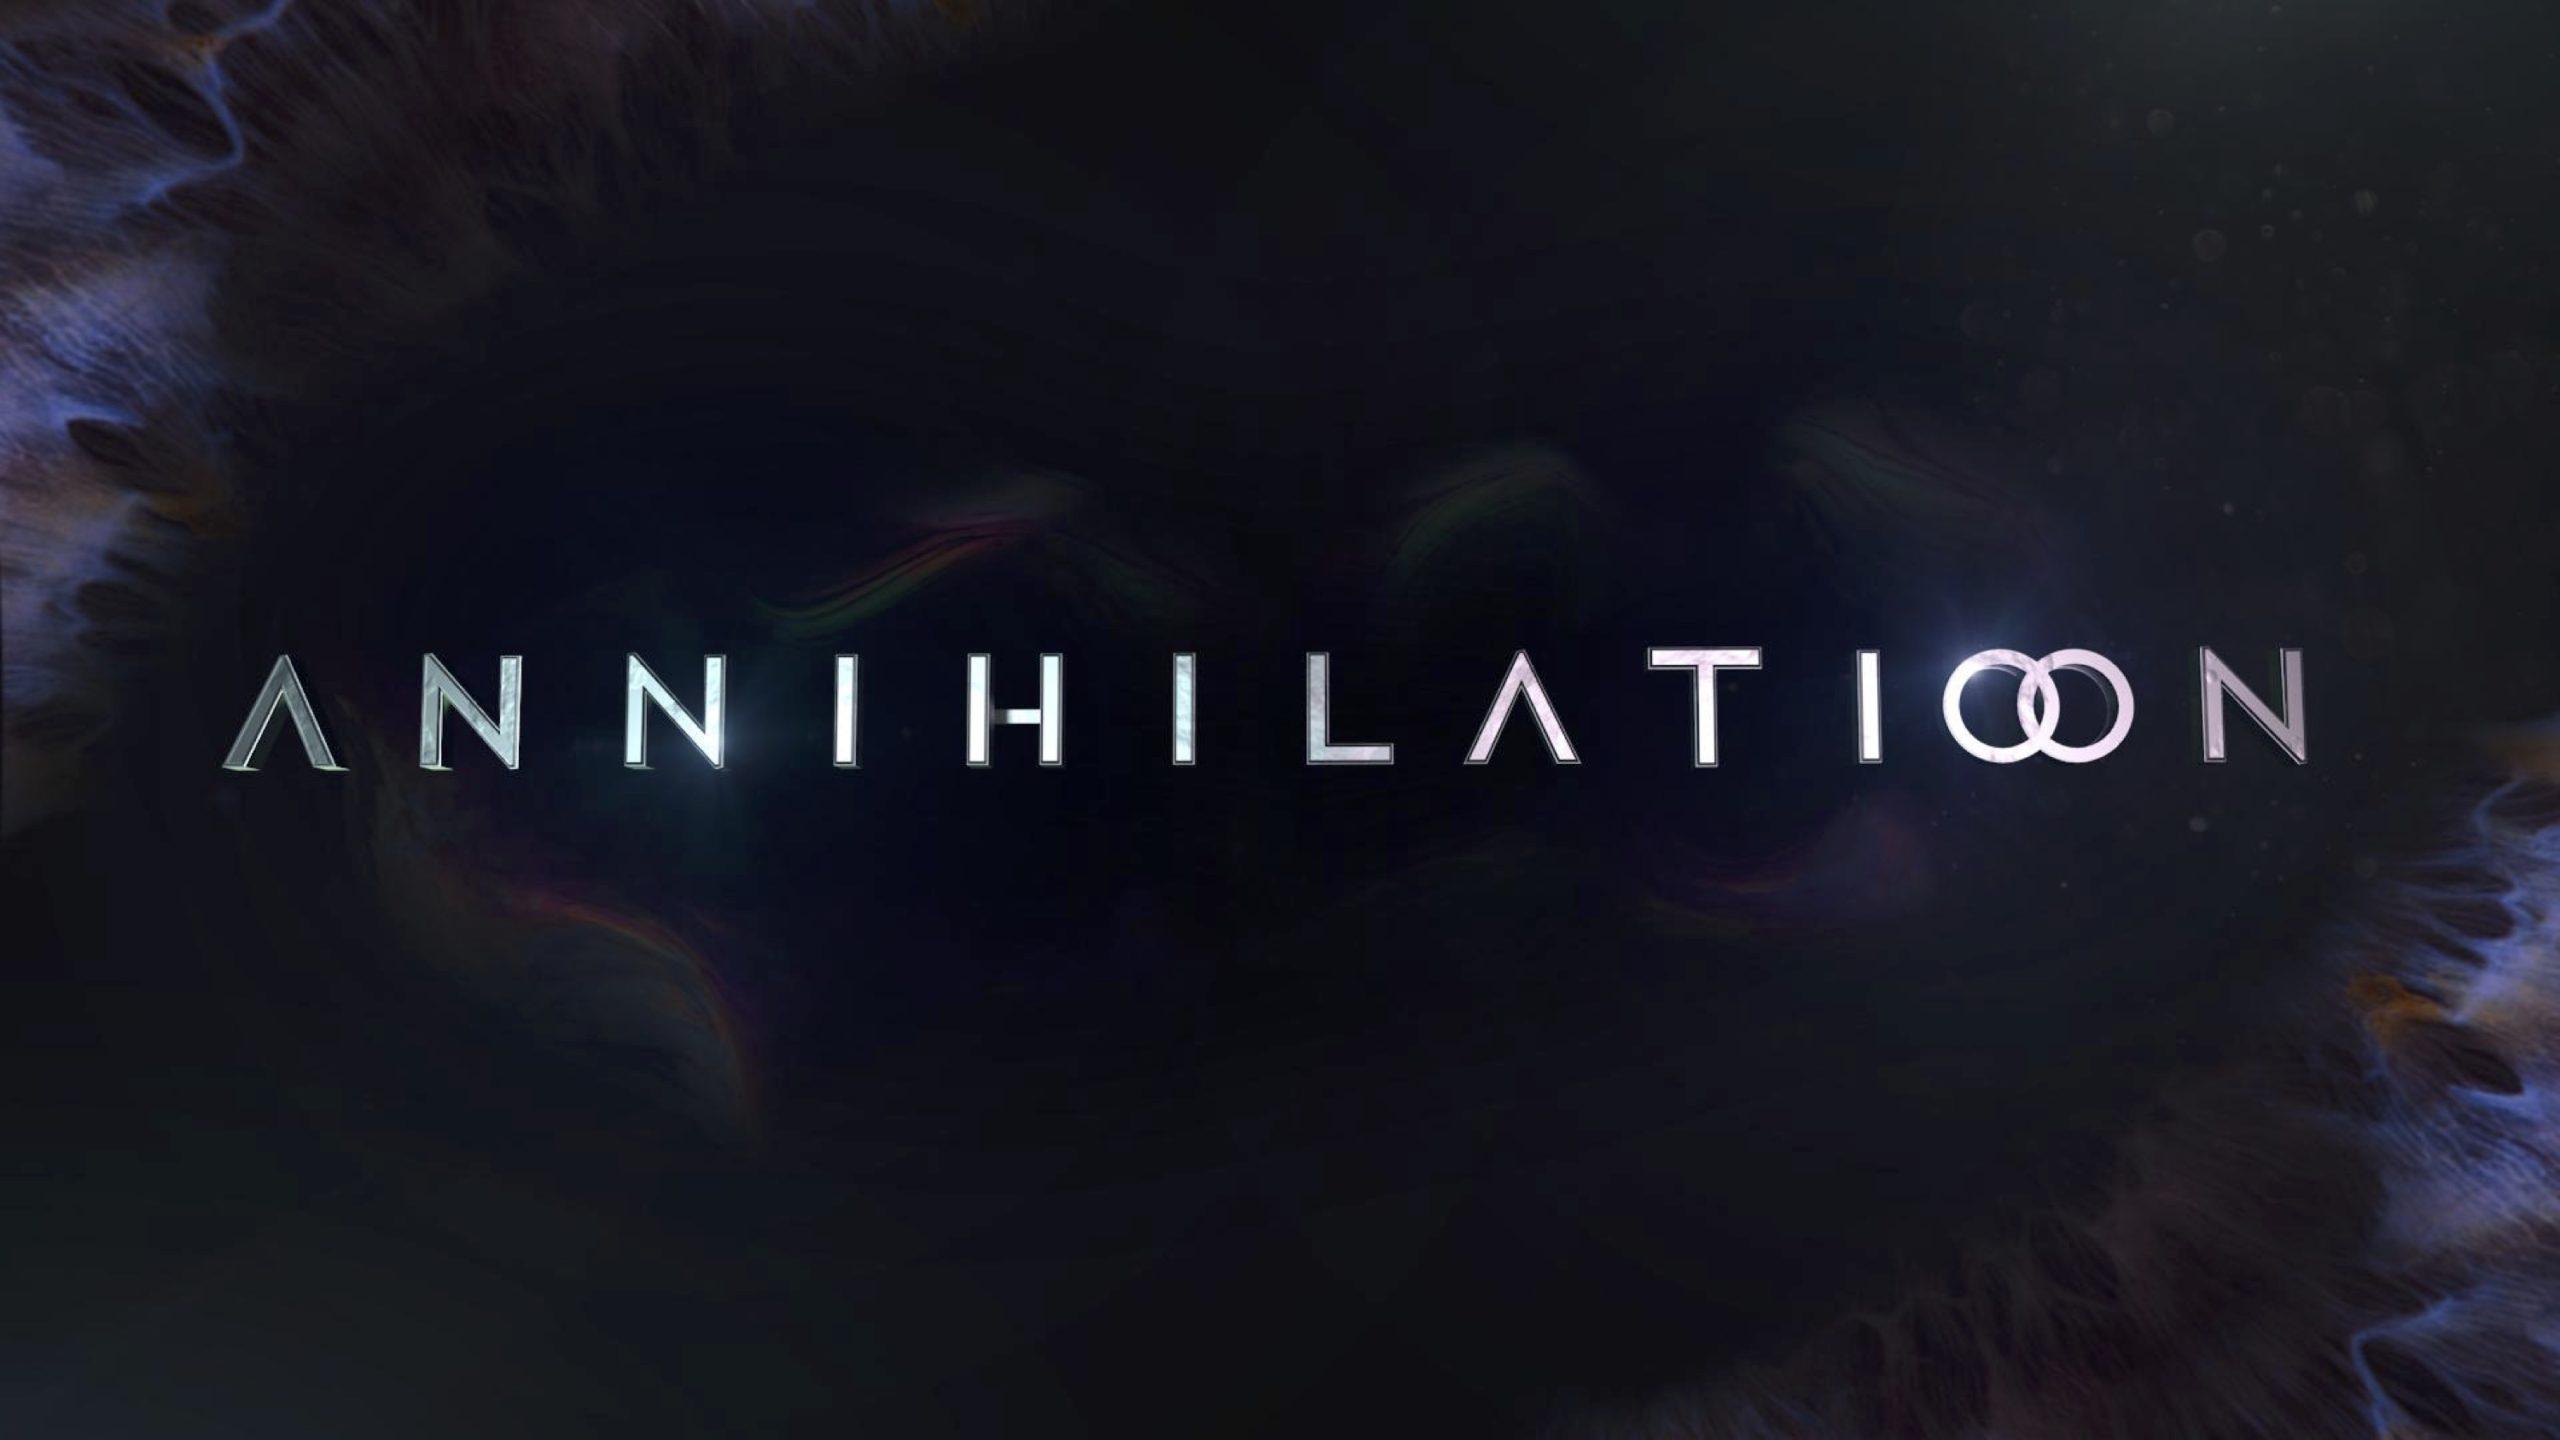 Annihilation Process 13